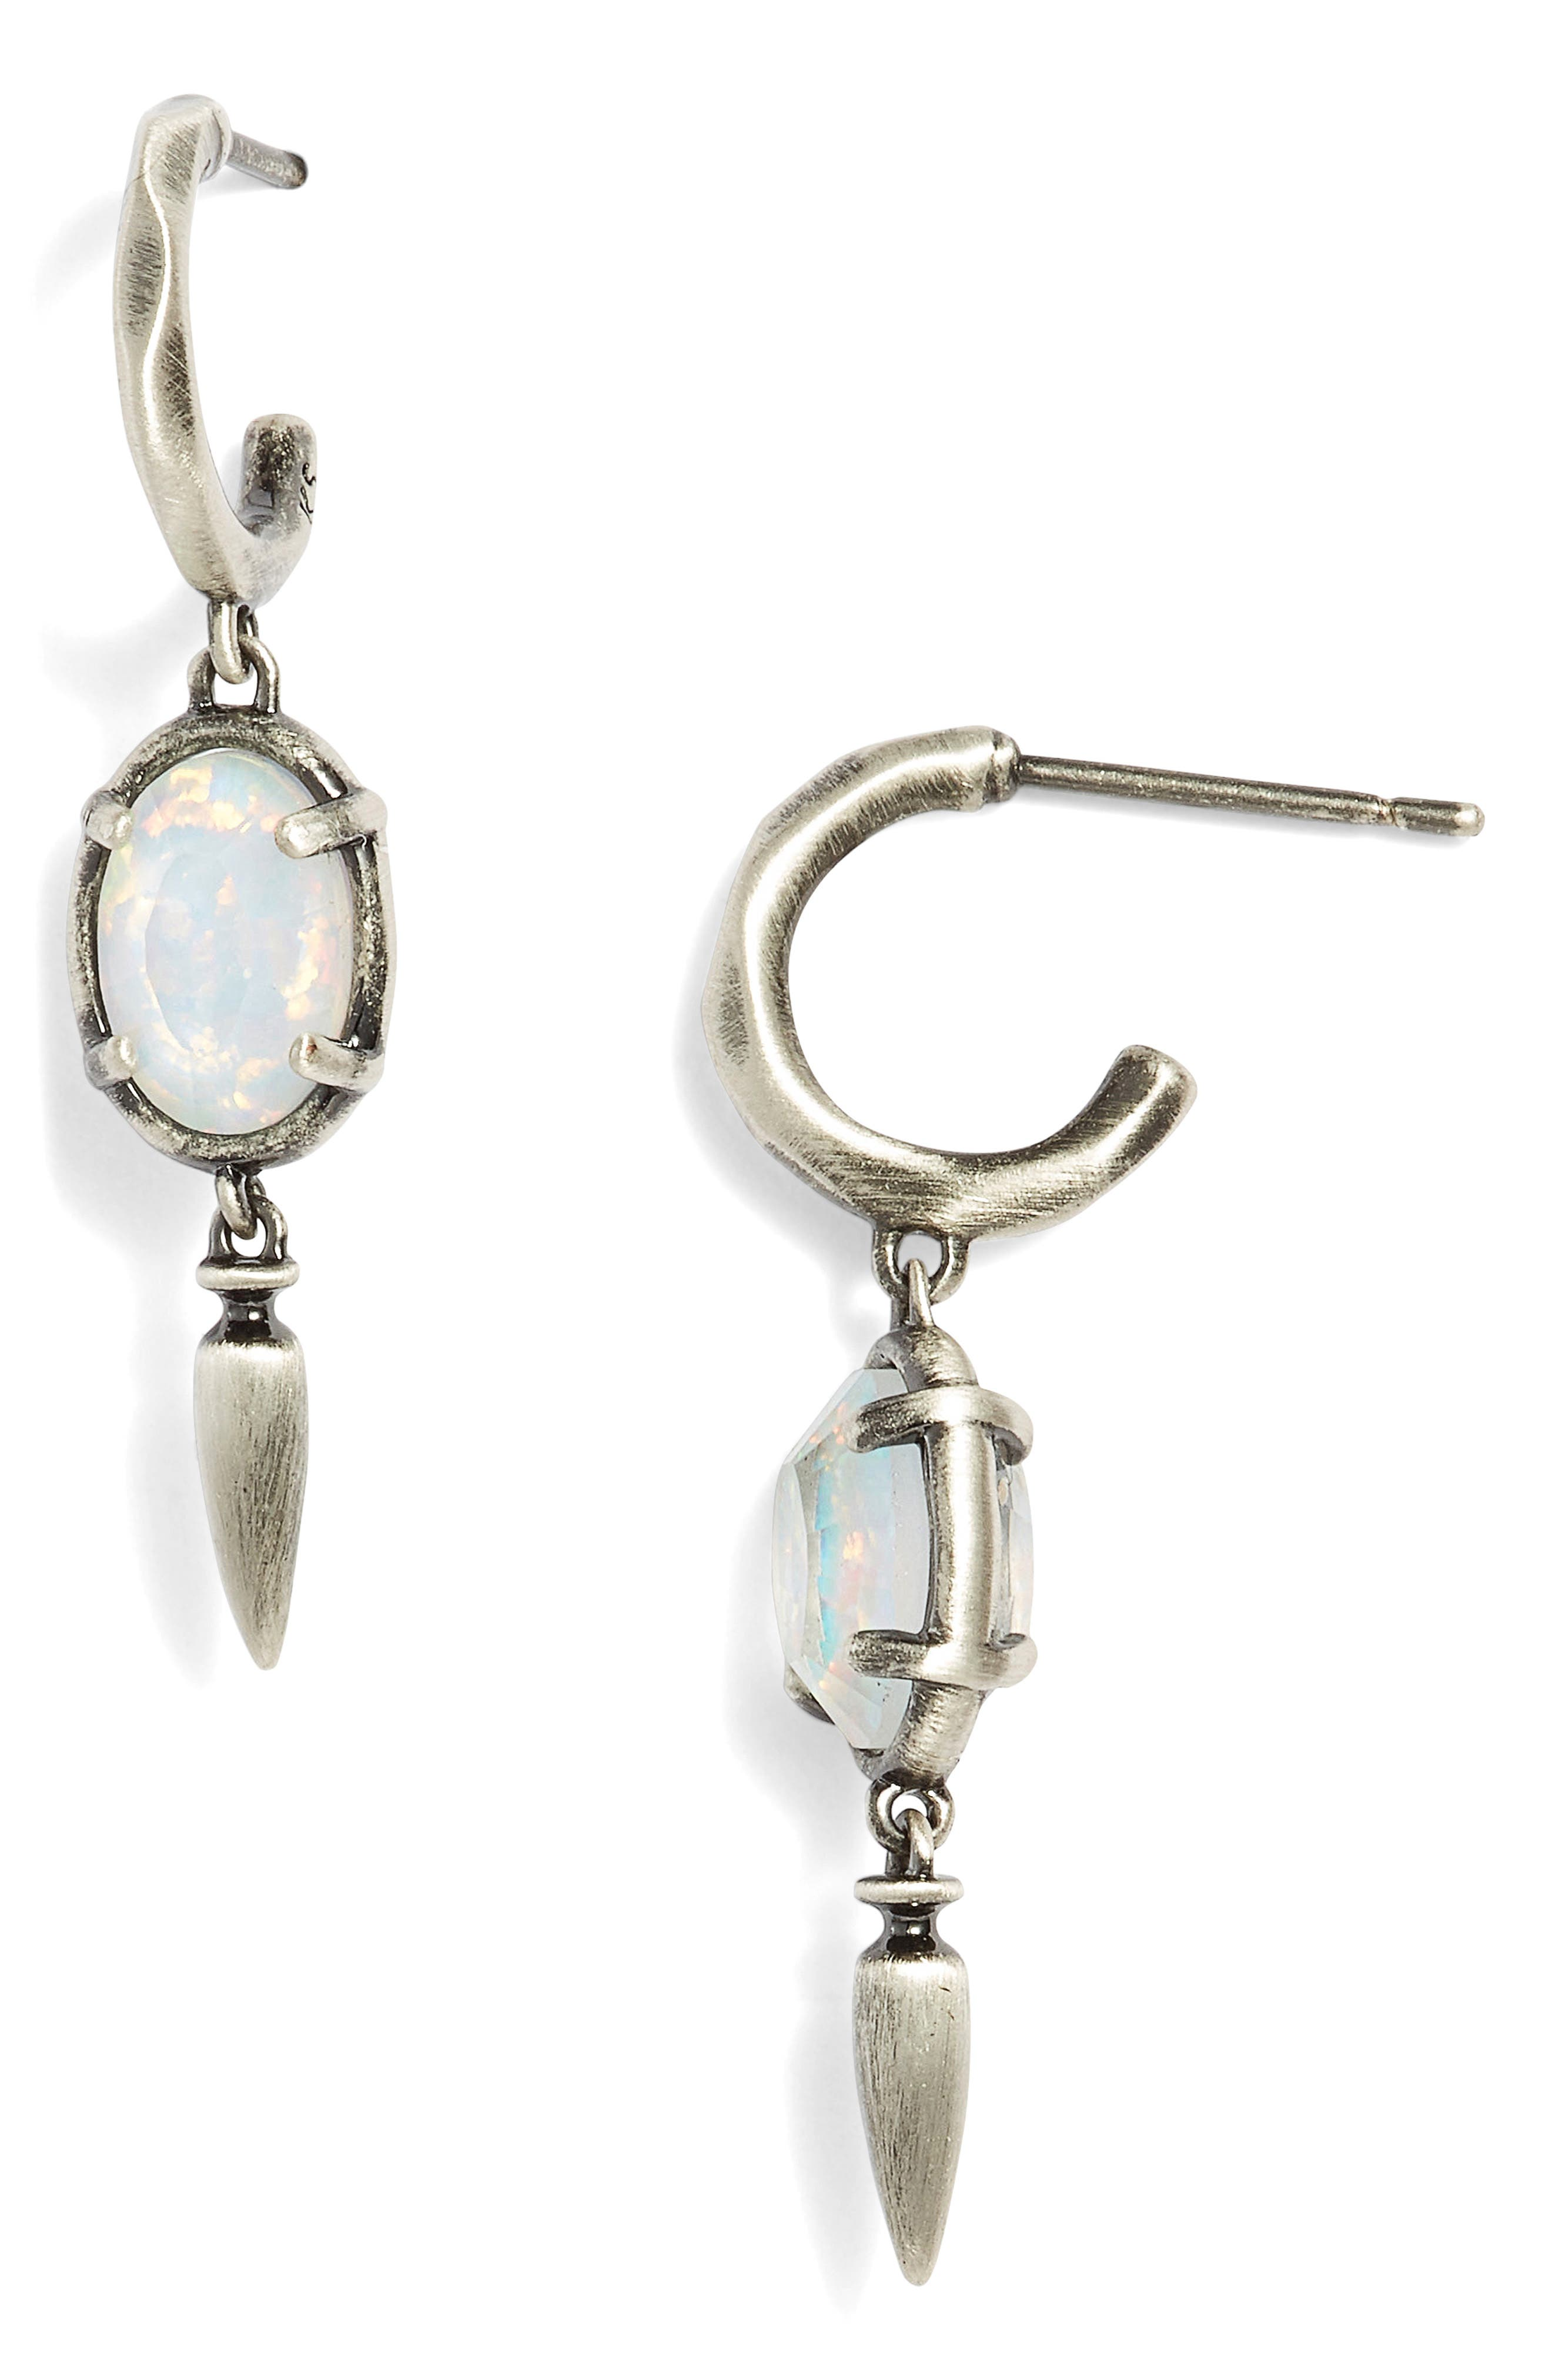 Trixie Drop Earrings,                             Main thumbnail 1, color,                             040